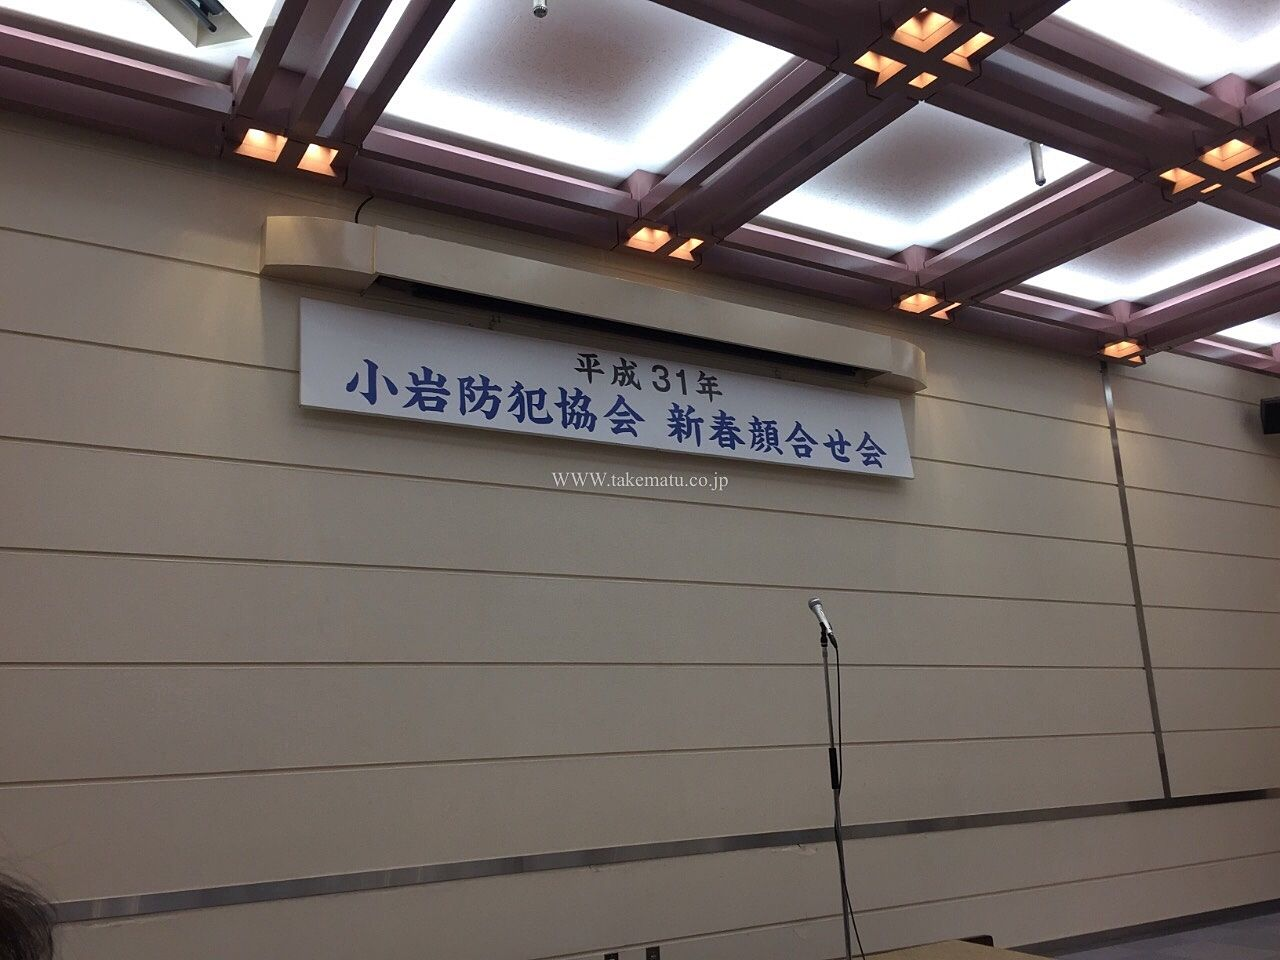 小岩防犯協会 新春顔合わせ会